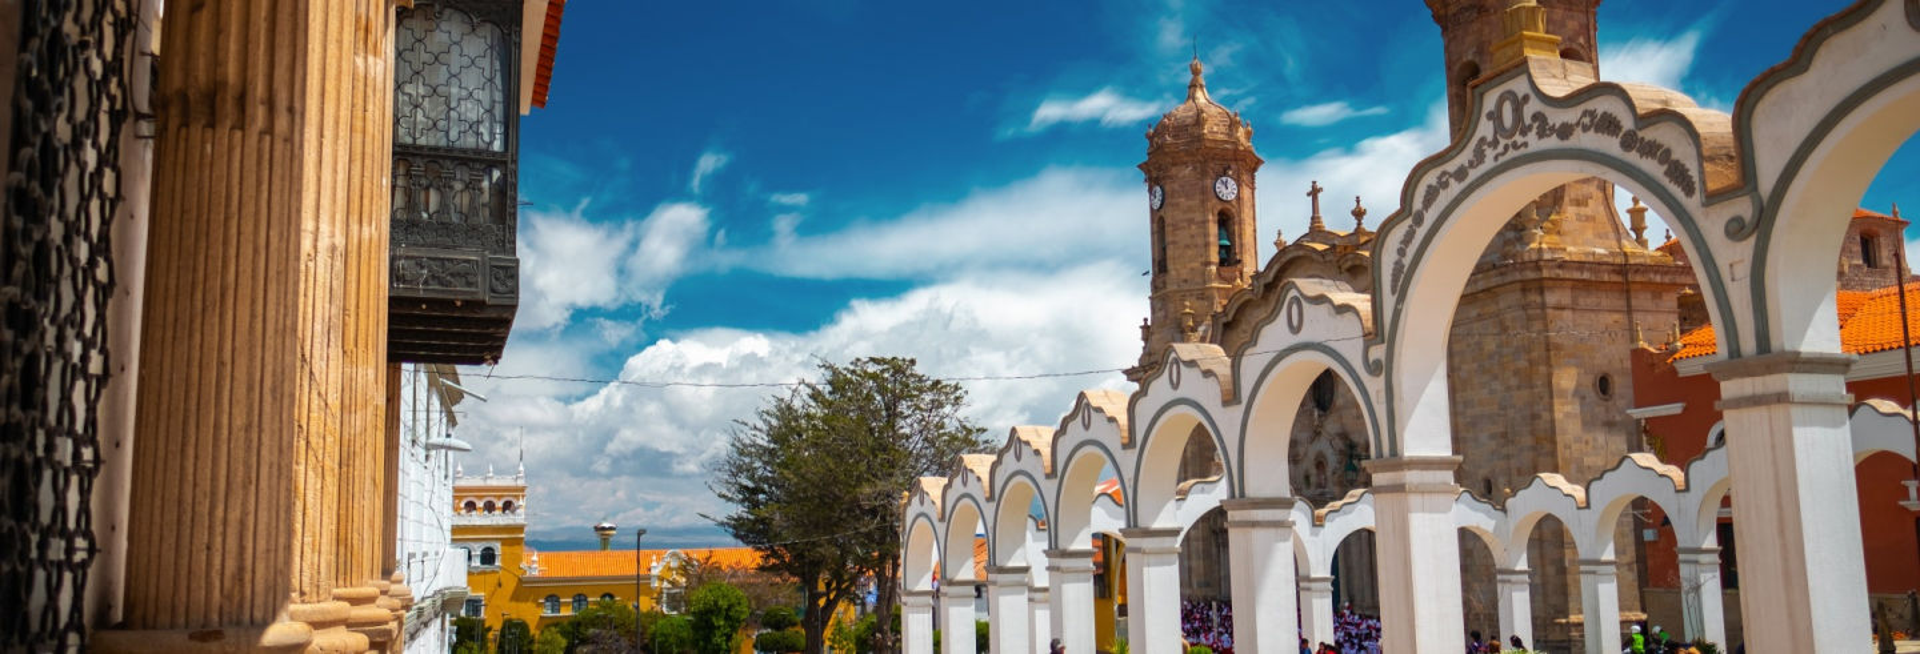 Tour de Potosí al completo